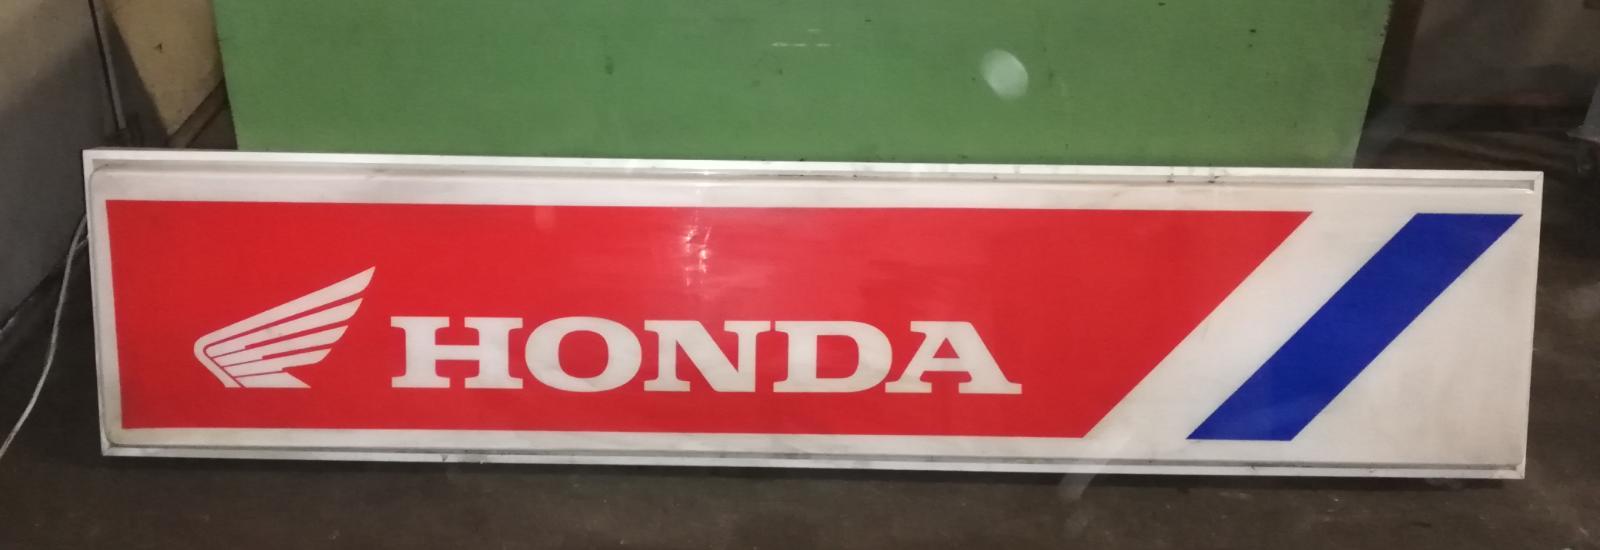 HONDA illuminated sign